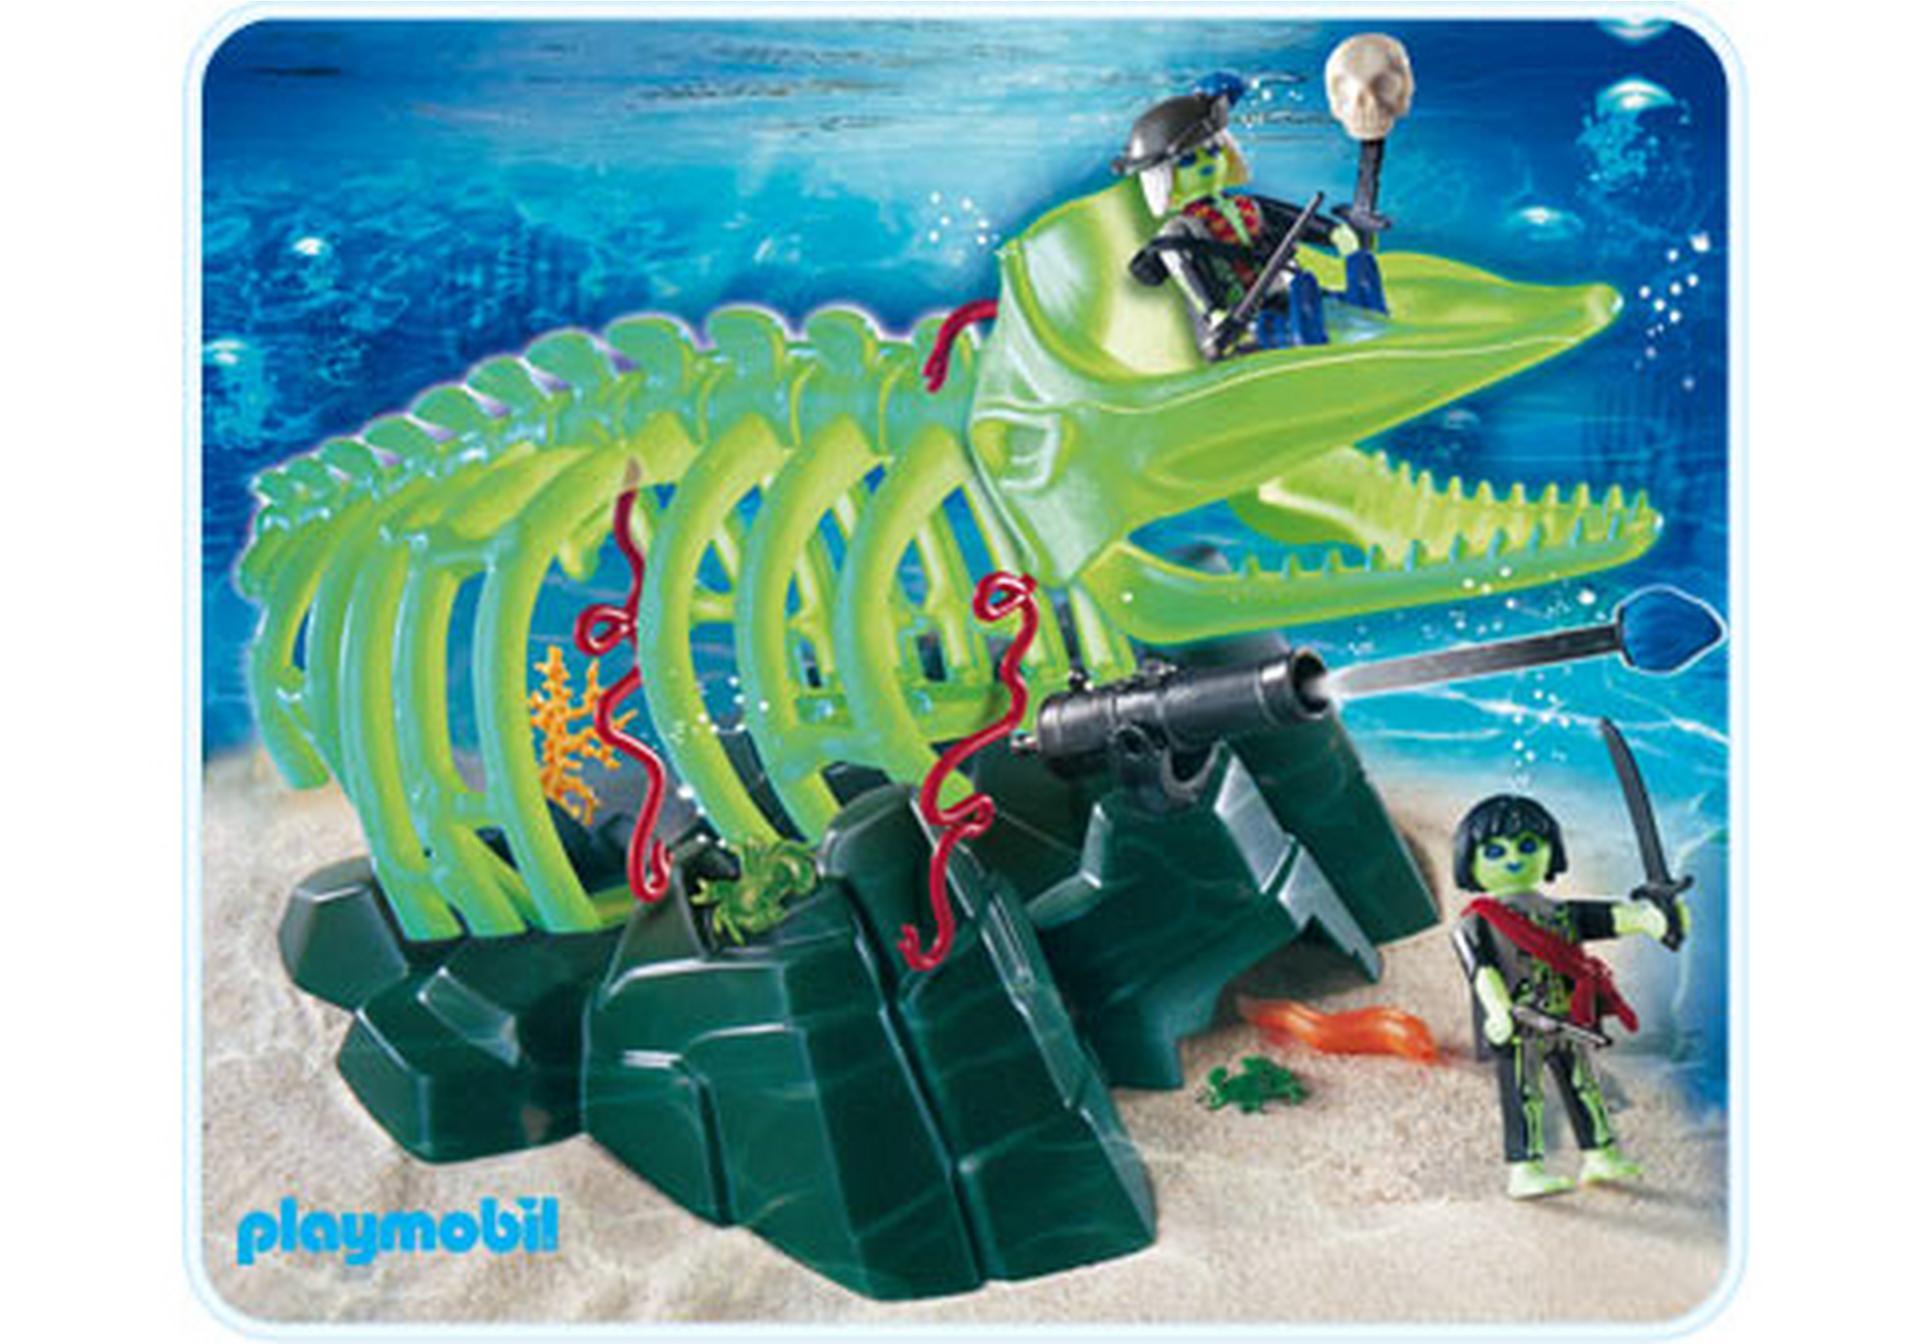 Geisterwalskelett 4803 a playmobil deutschland - Playmobil pirate fantome ...